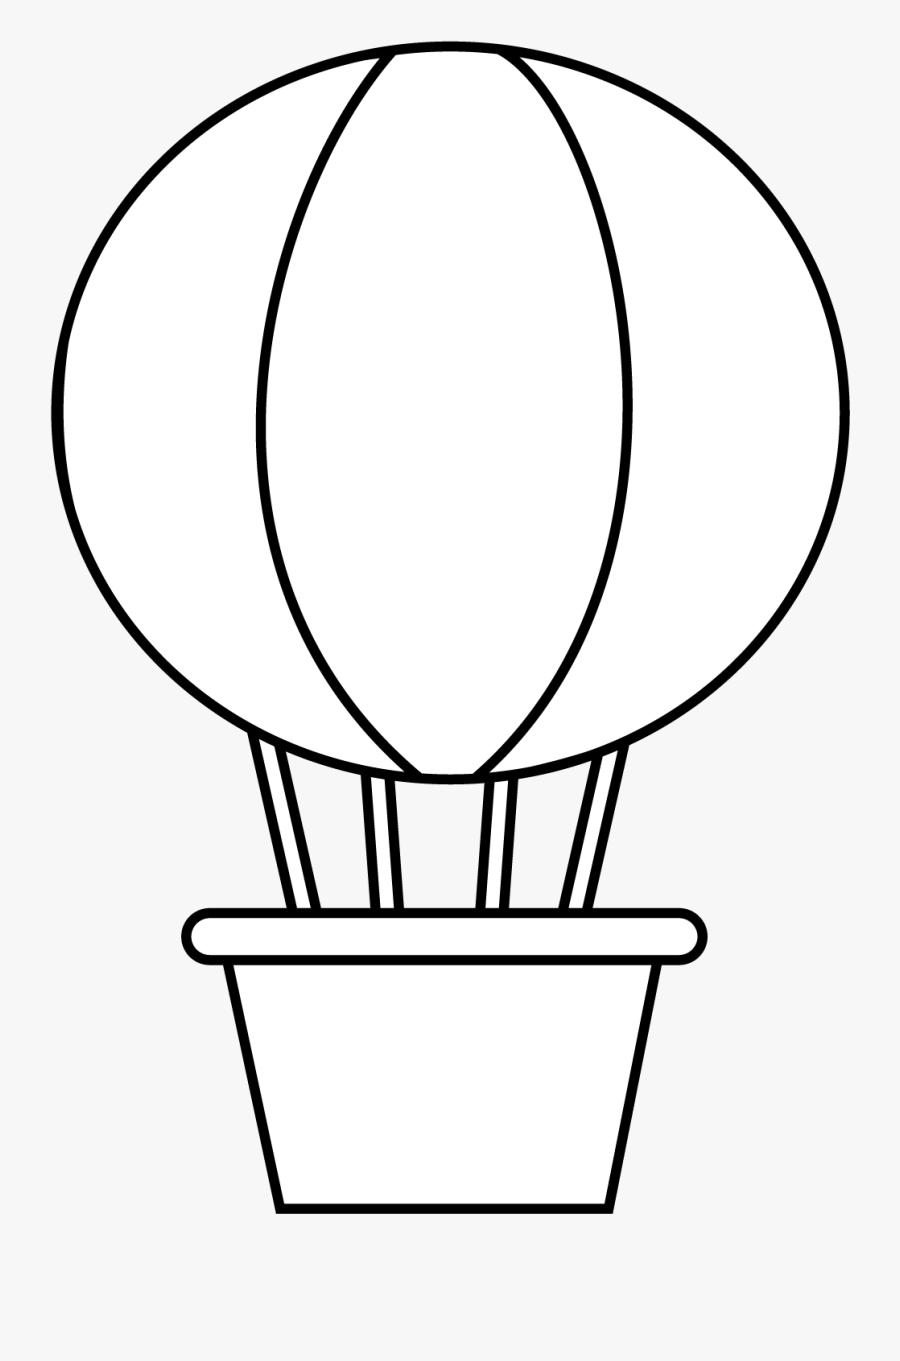 Clip Art Transparent Stock Hot Air Balloon Black And - Figuras Geometricas Para Armar Esfera, Transparent Clipart